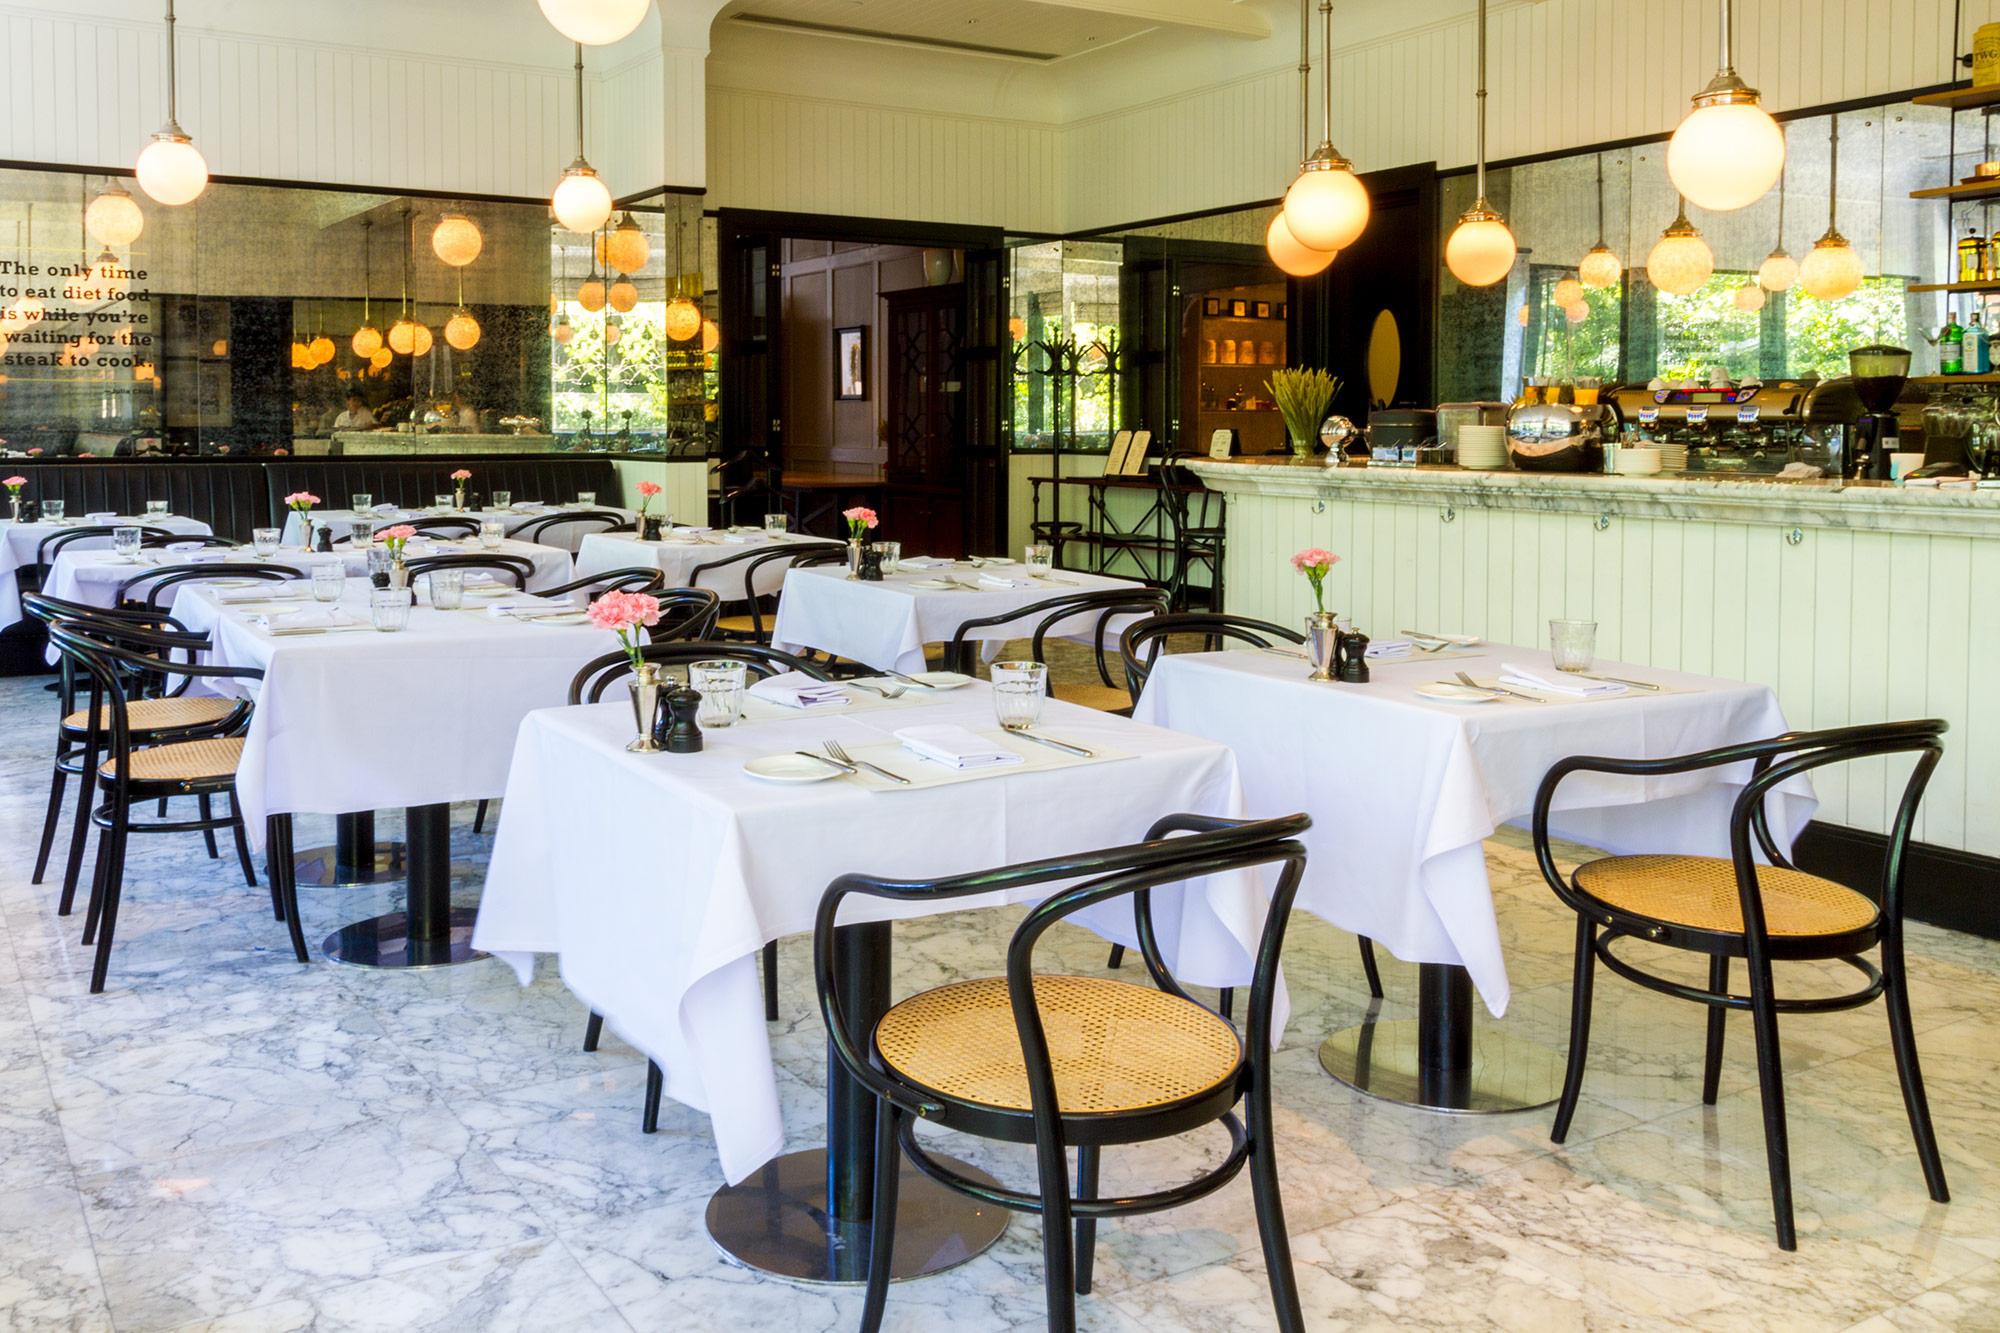 Cafè Claire Oriental Residence  Cafe Claire คาเฟ่แคลร์ โรงแรมโอเรียนเต็ล เรสซิเดนซ์ กรุงเทพฯ IMG 8231